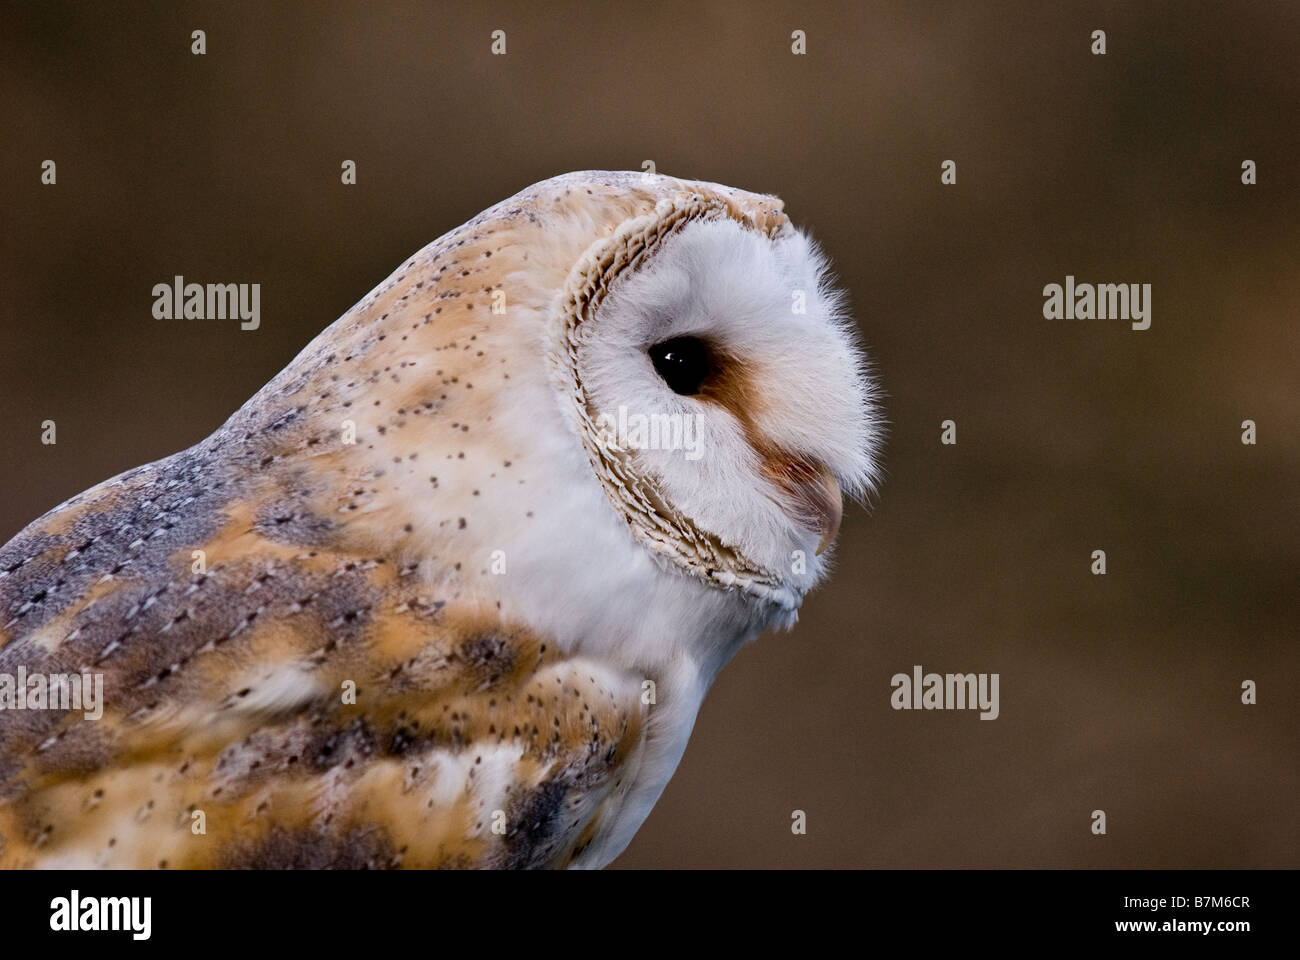 A profile of a Barn Owl. - Stock Image